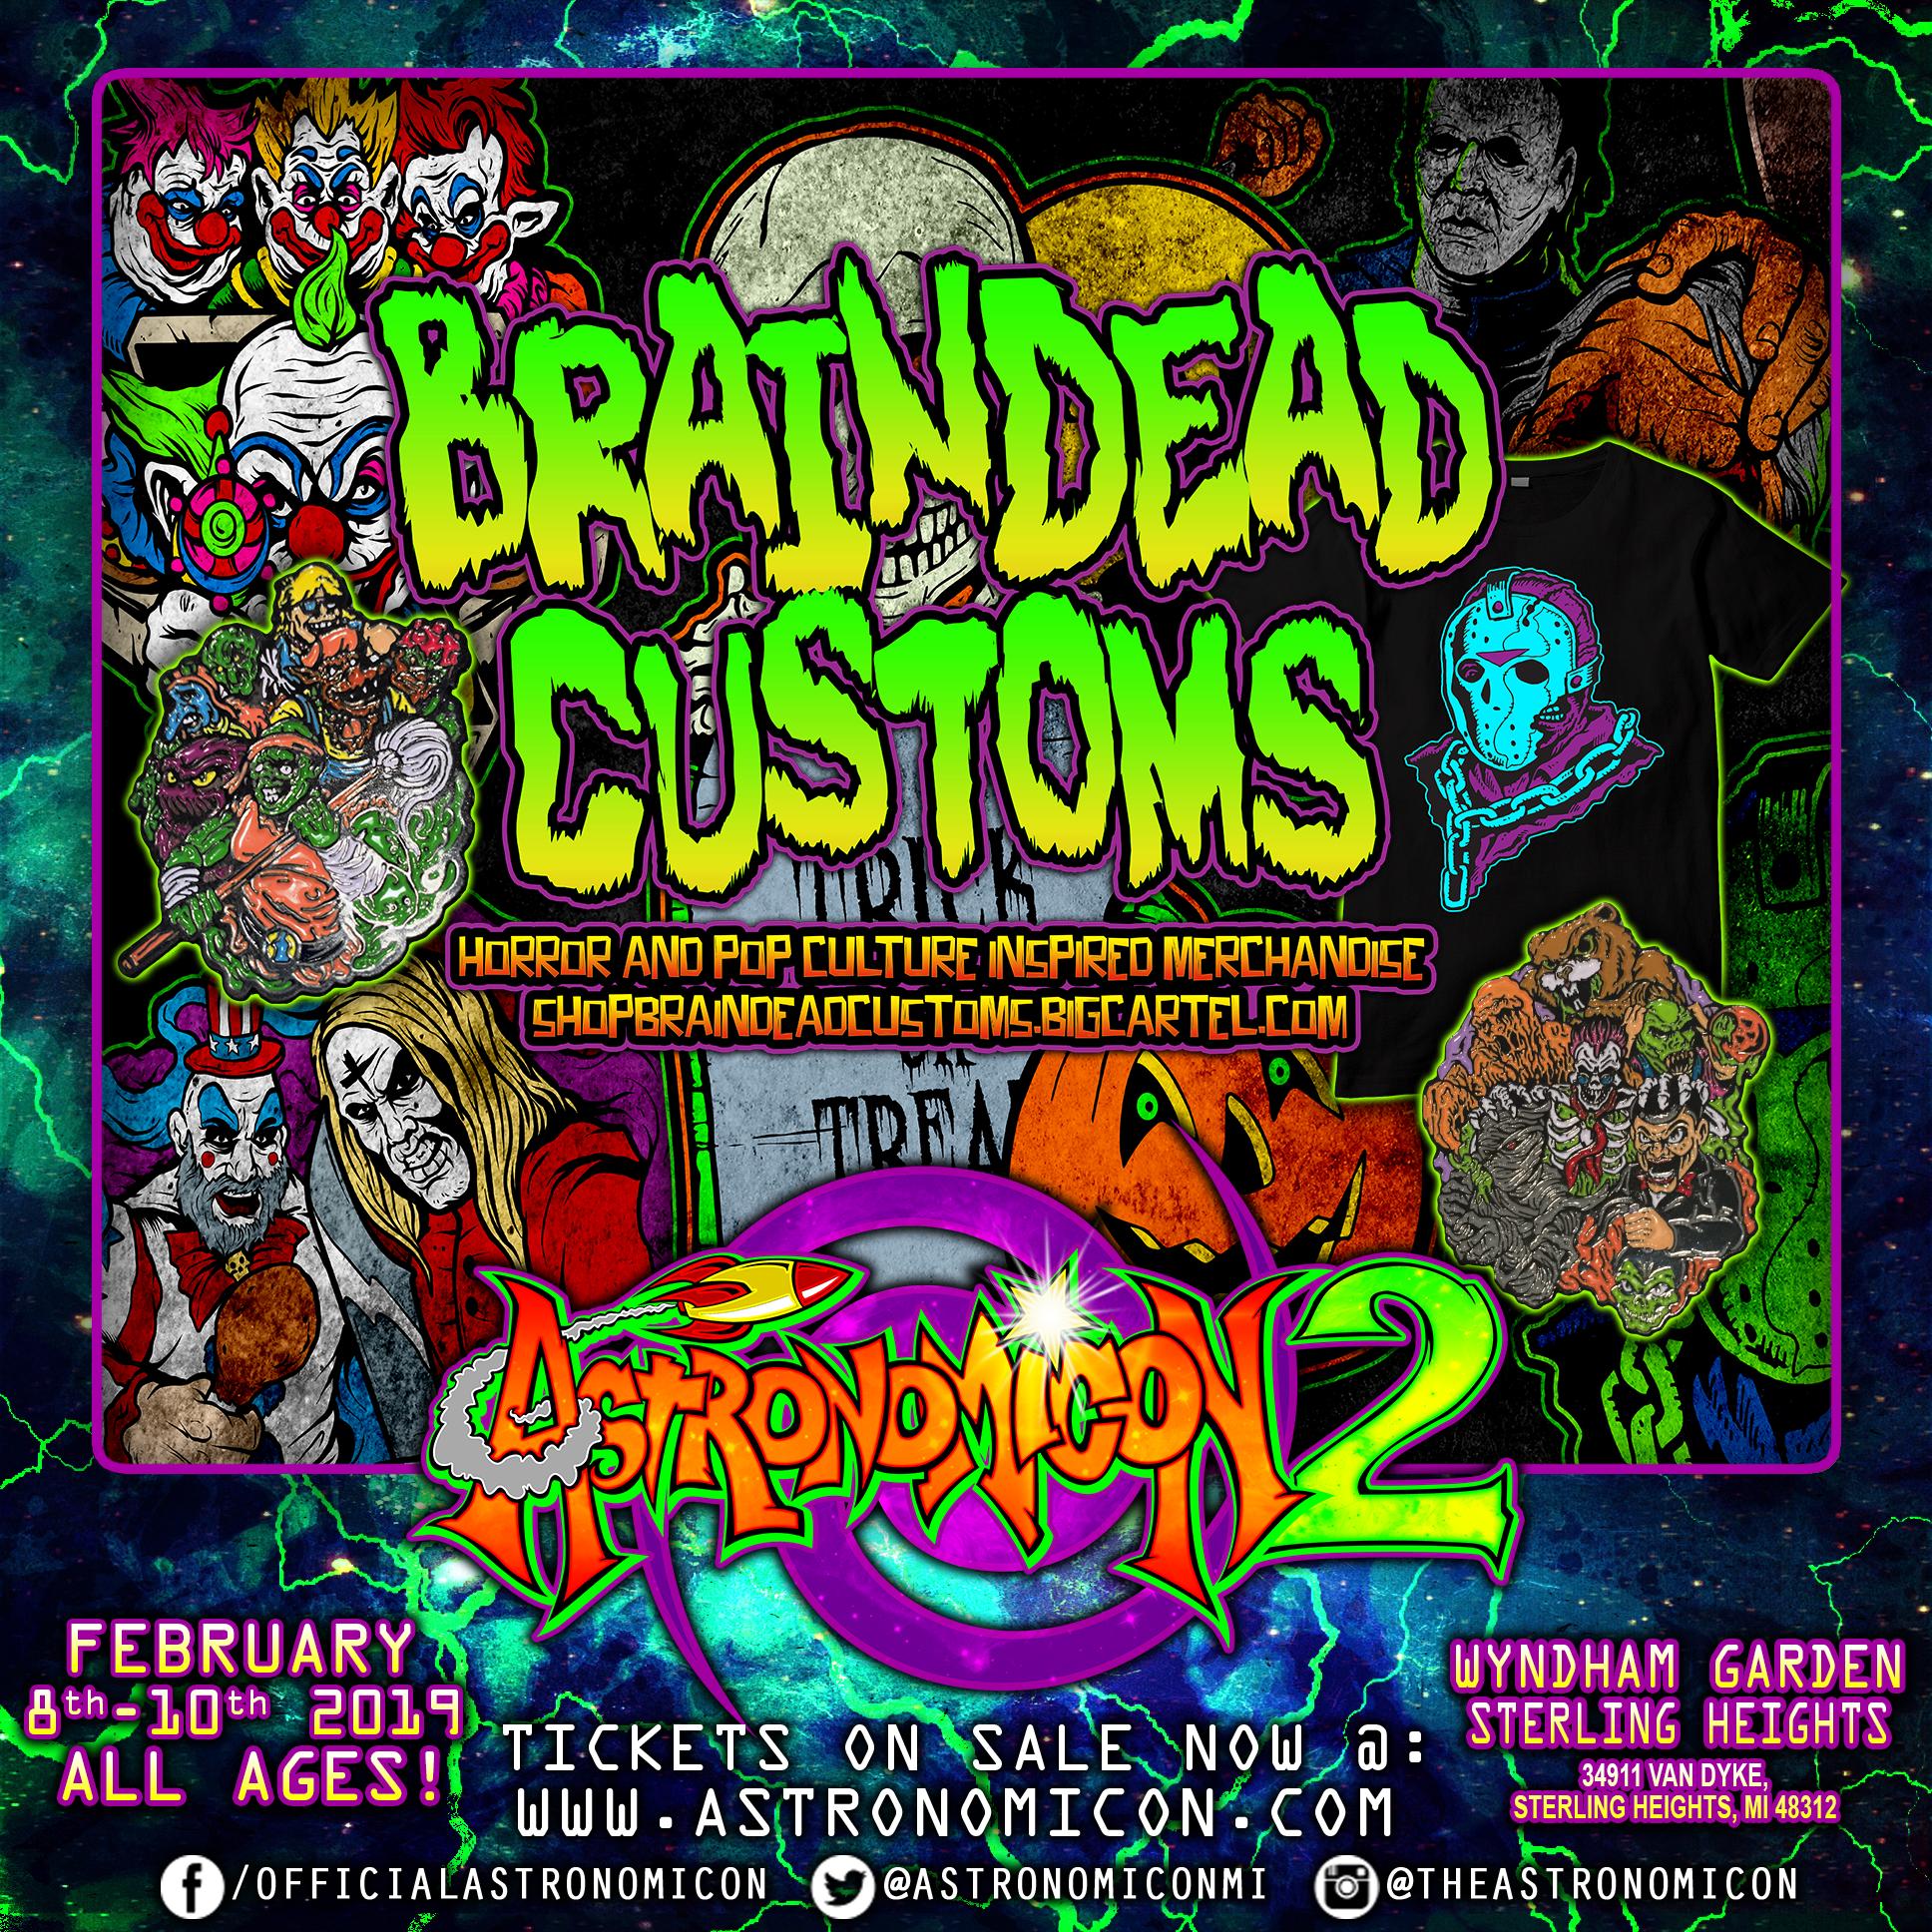 Astronomicon 2 Braindead Customs IG Ad.png